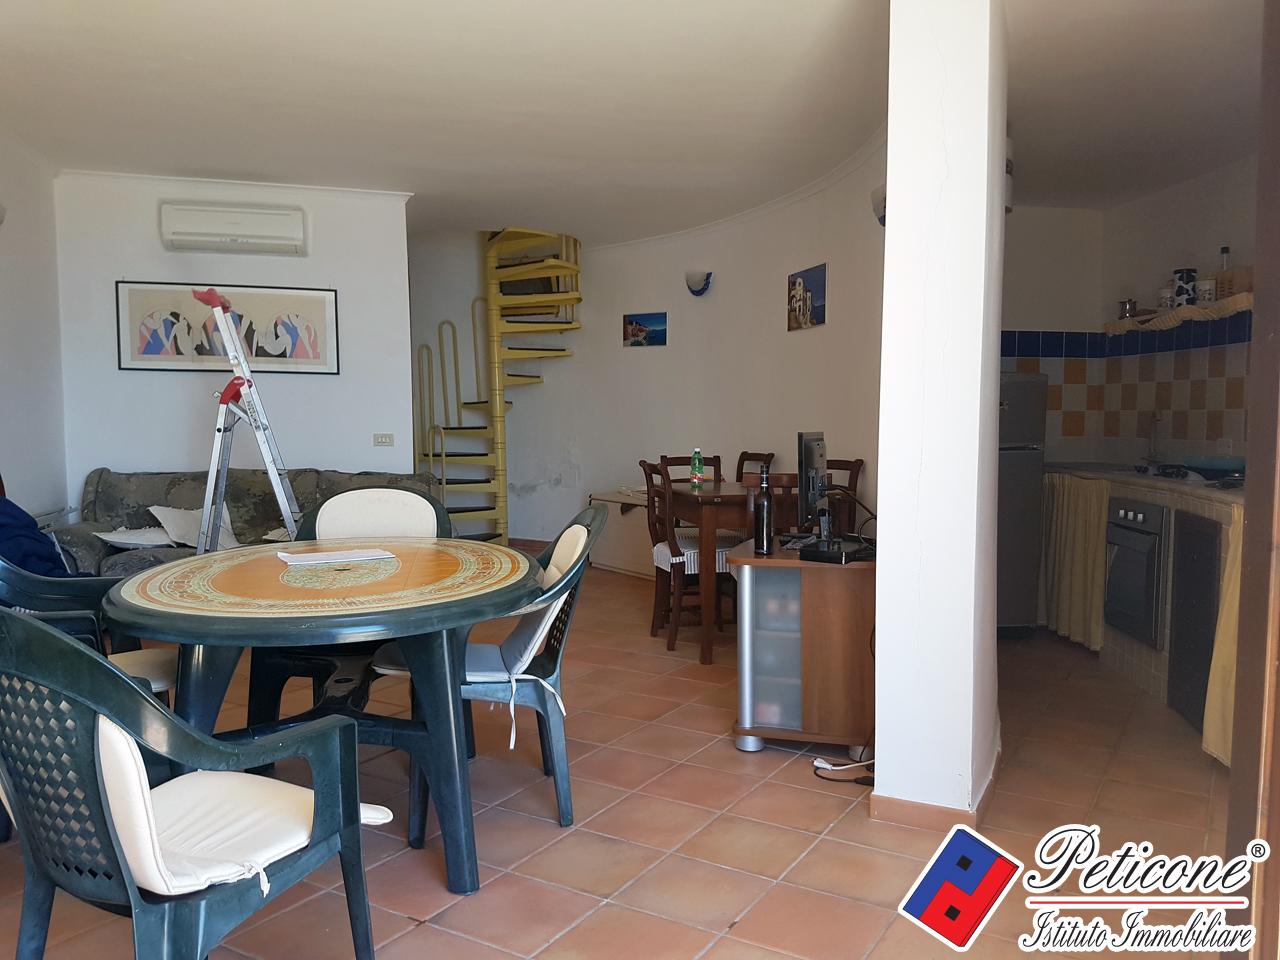 Villa in Vendita a Sperlonga: 4 locali, 90 mq - Foto 6